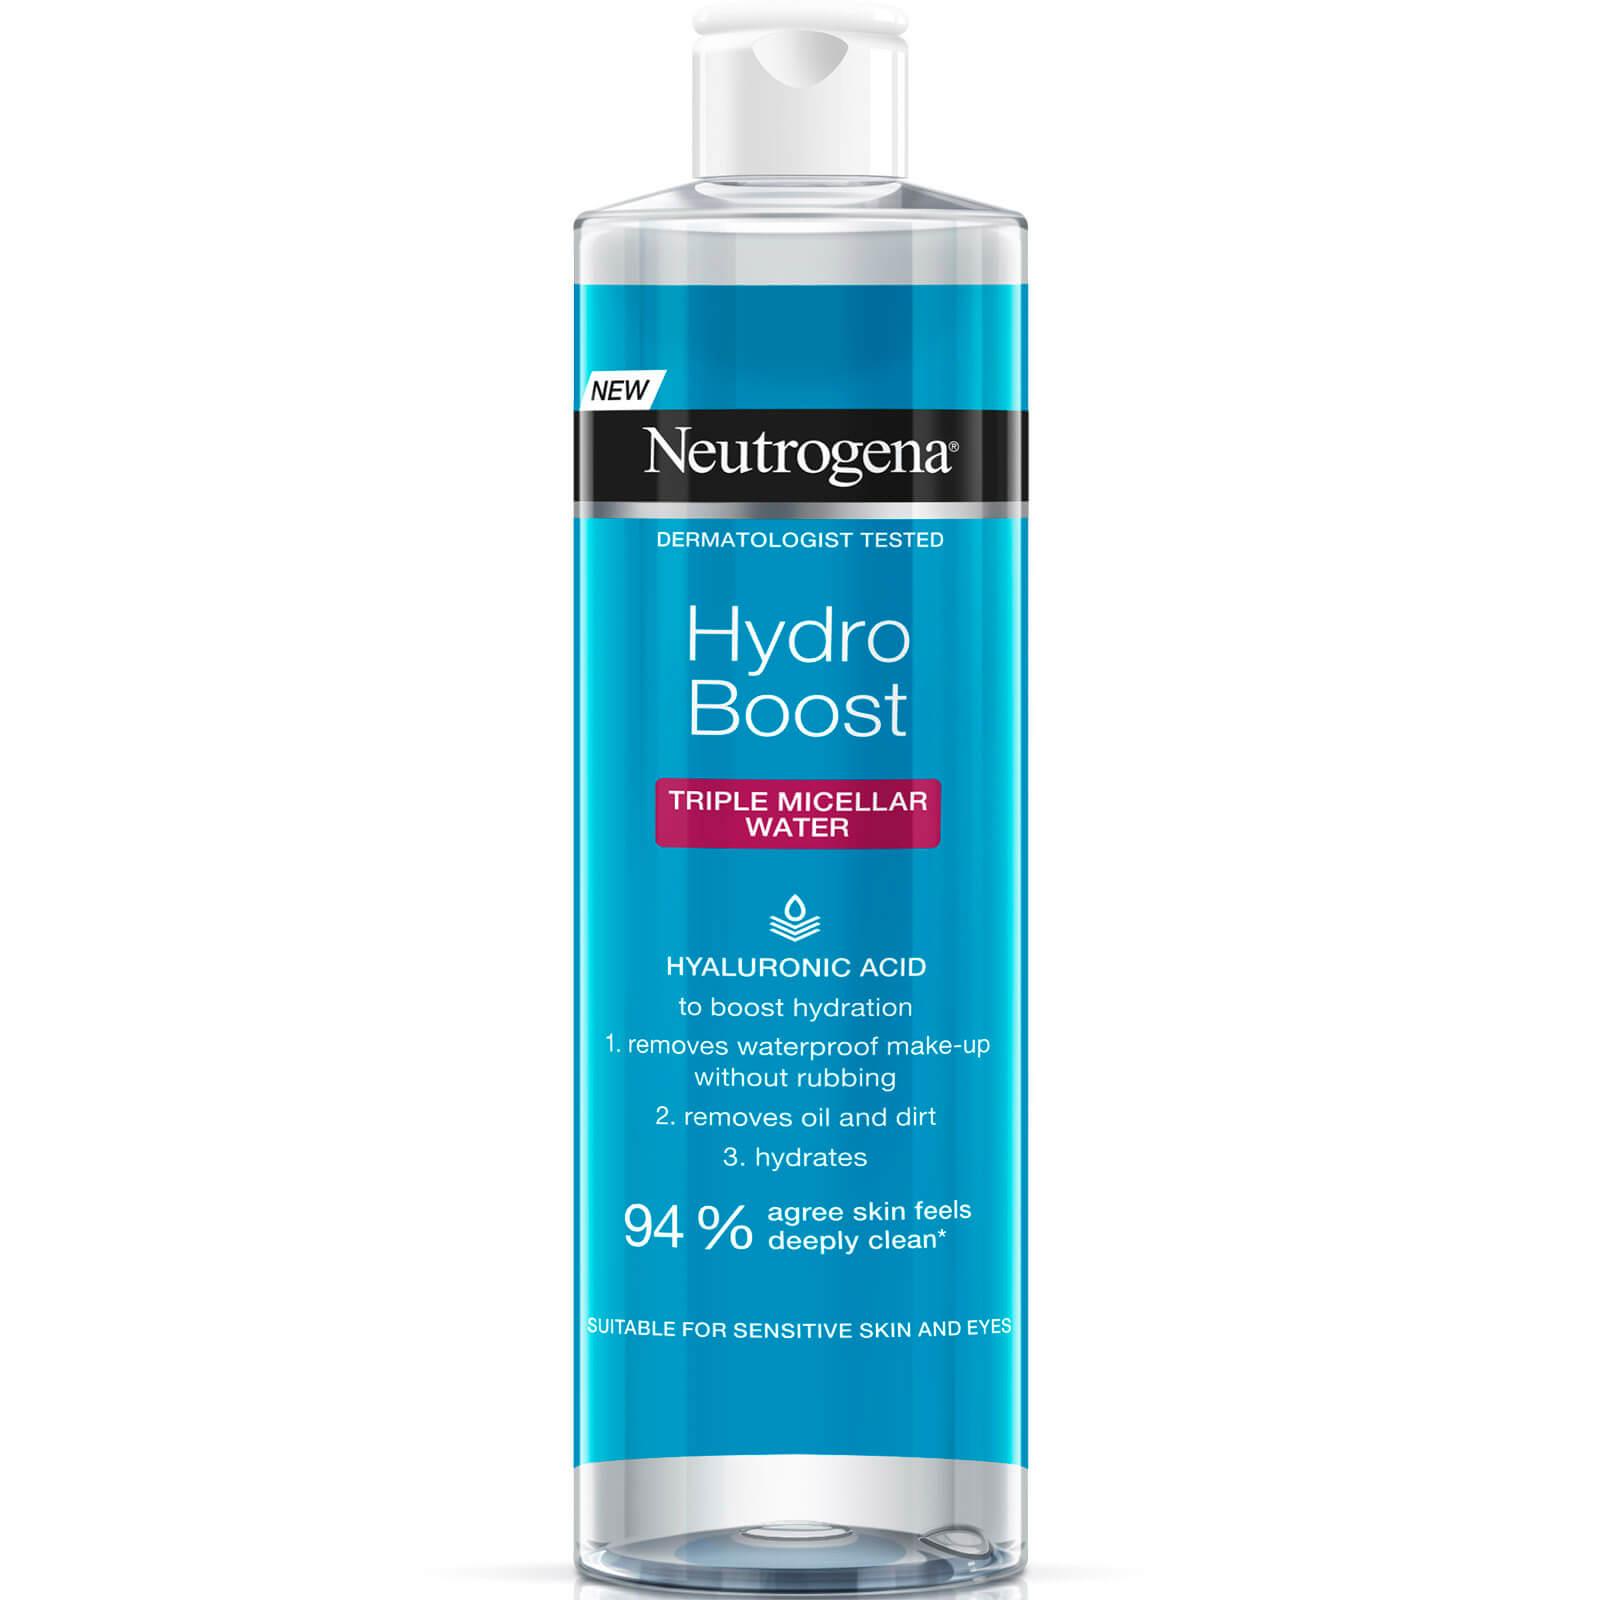 Agua micelar Hydro Boost de Neutrogena